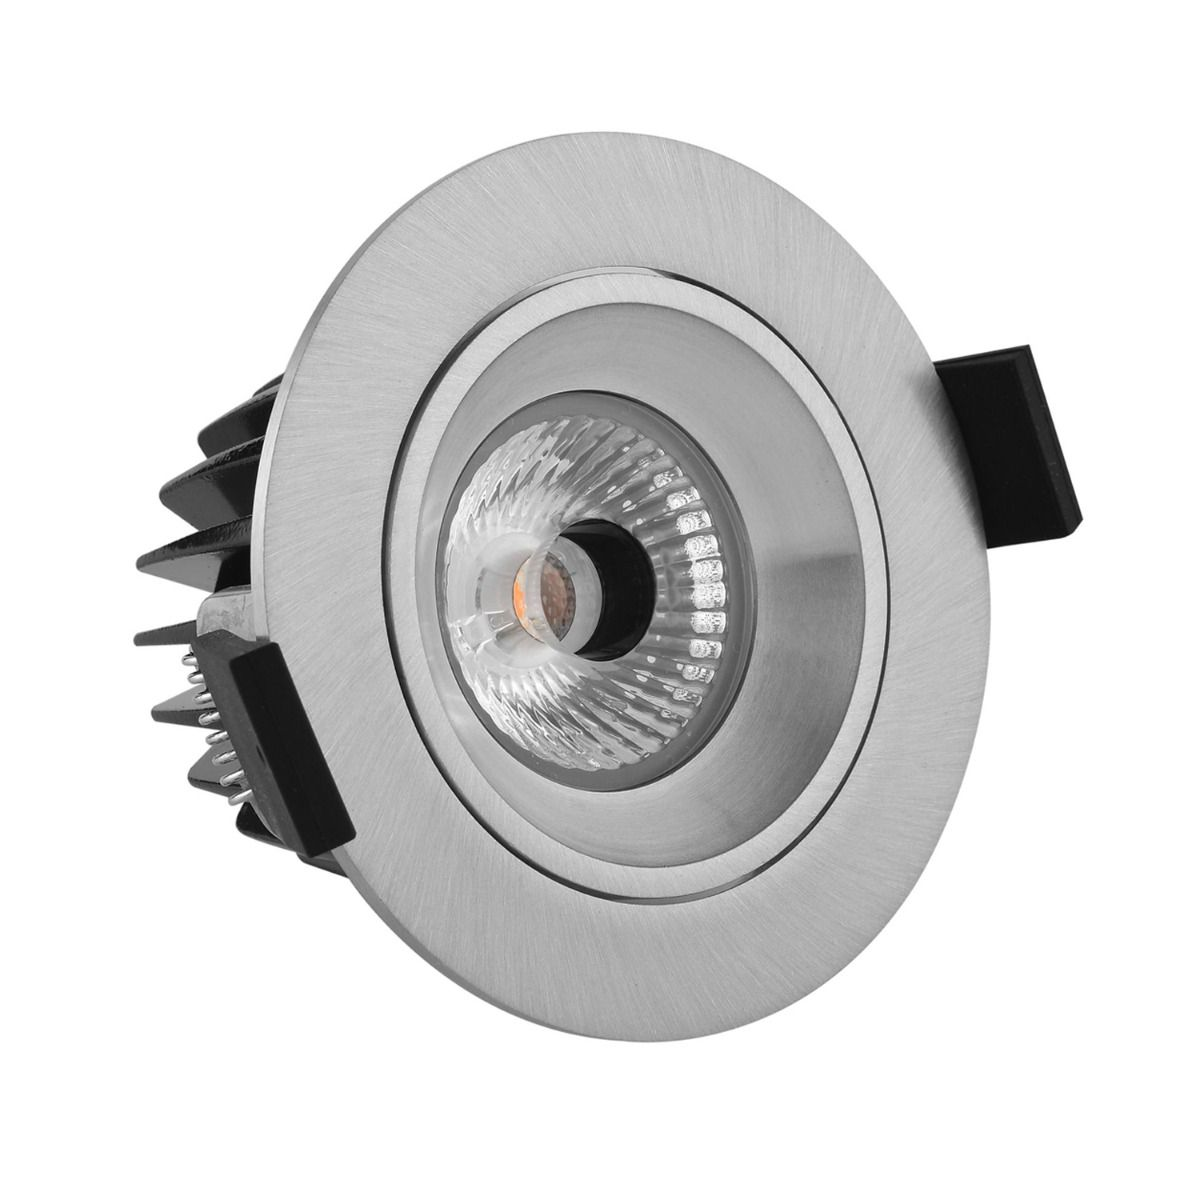 Noxion LED-Spot Diamond IP44 2700K Aluminium | Höchste Farbwiedergabe - Dimmbar